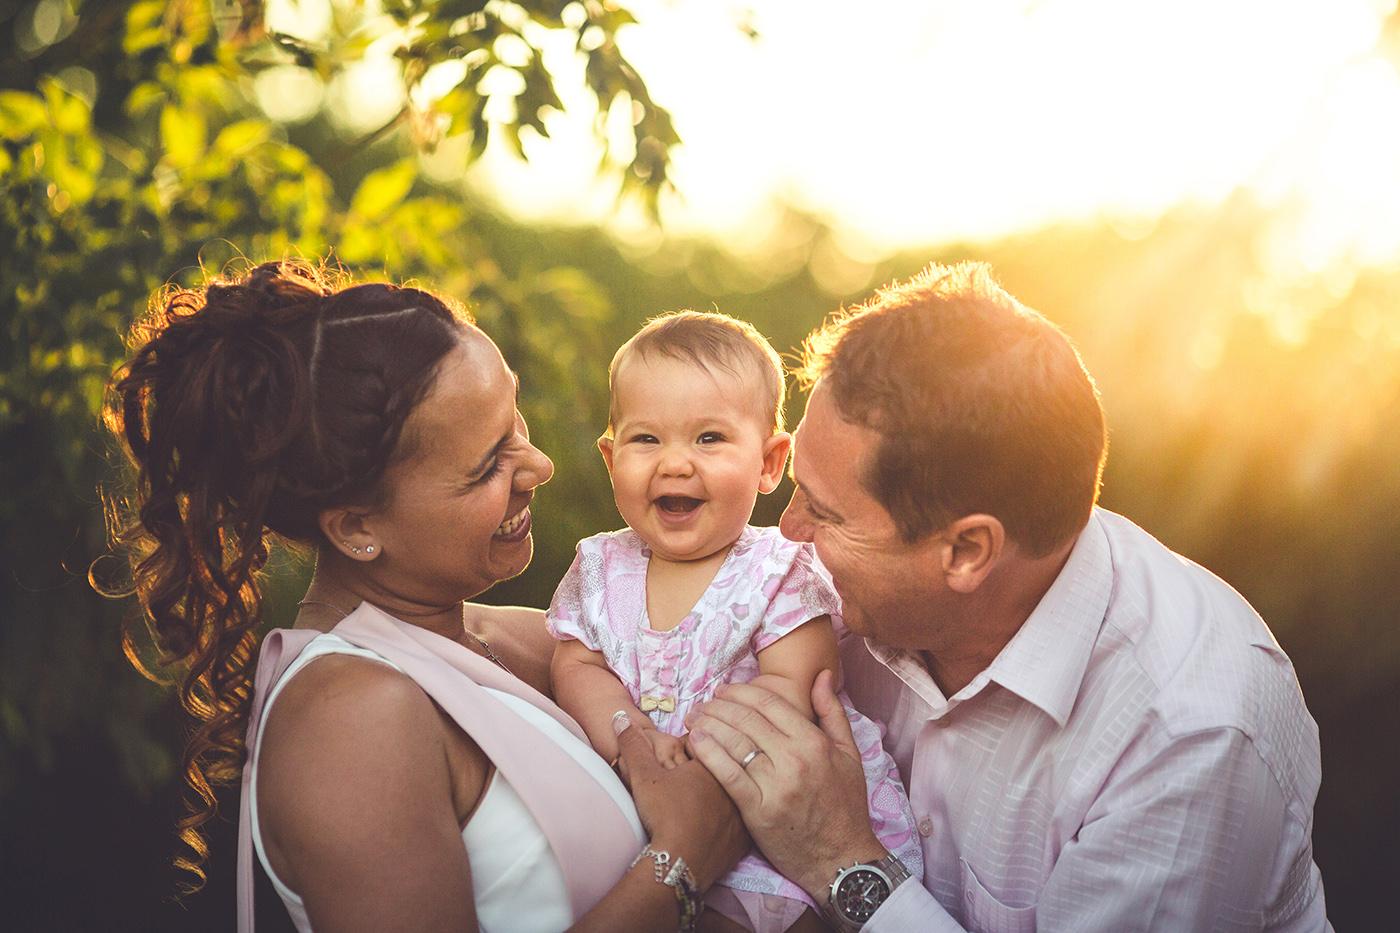 photographe-famille-enfant-bapteme-poitiers-guillaume-heraud-18